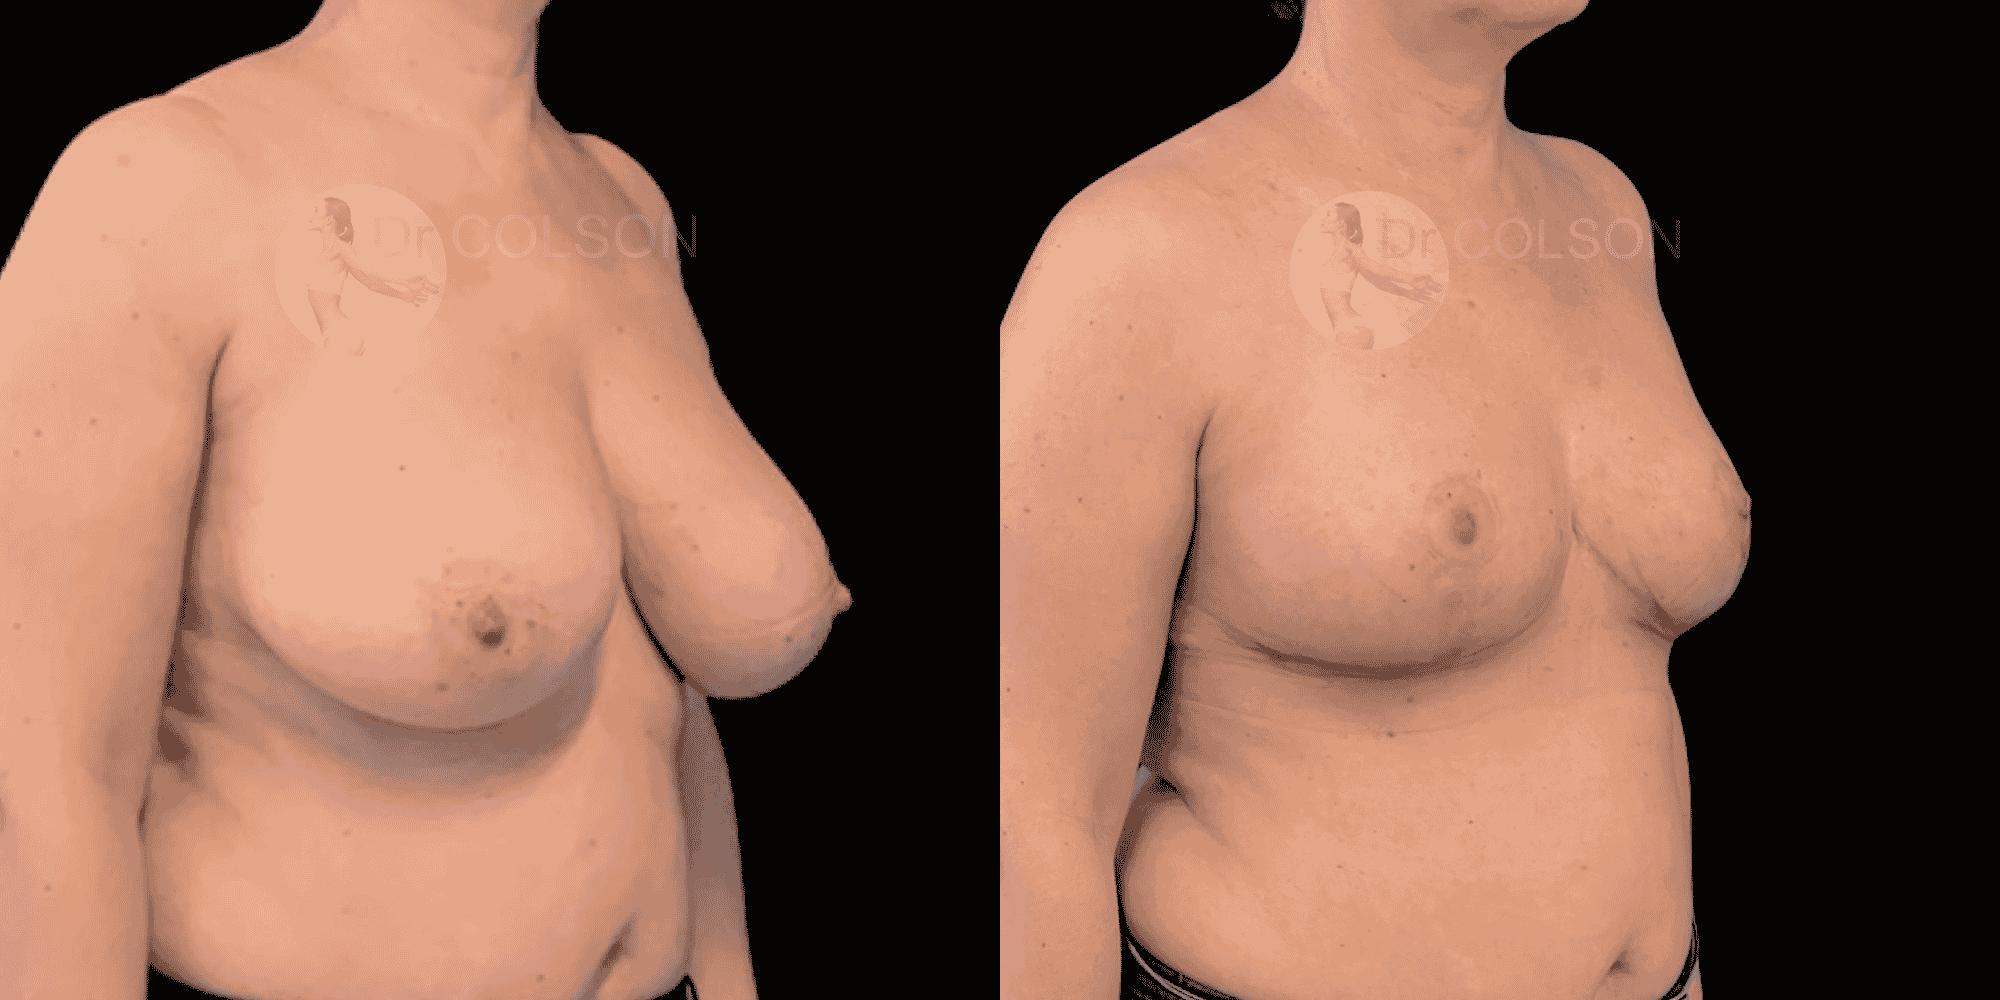 Dr Colson - Chirurgie sein - Reduction Mammaire Trois Quart